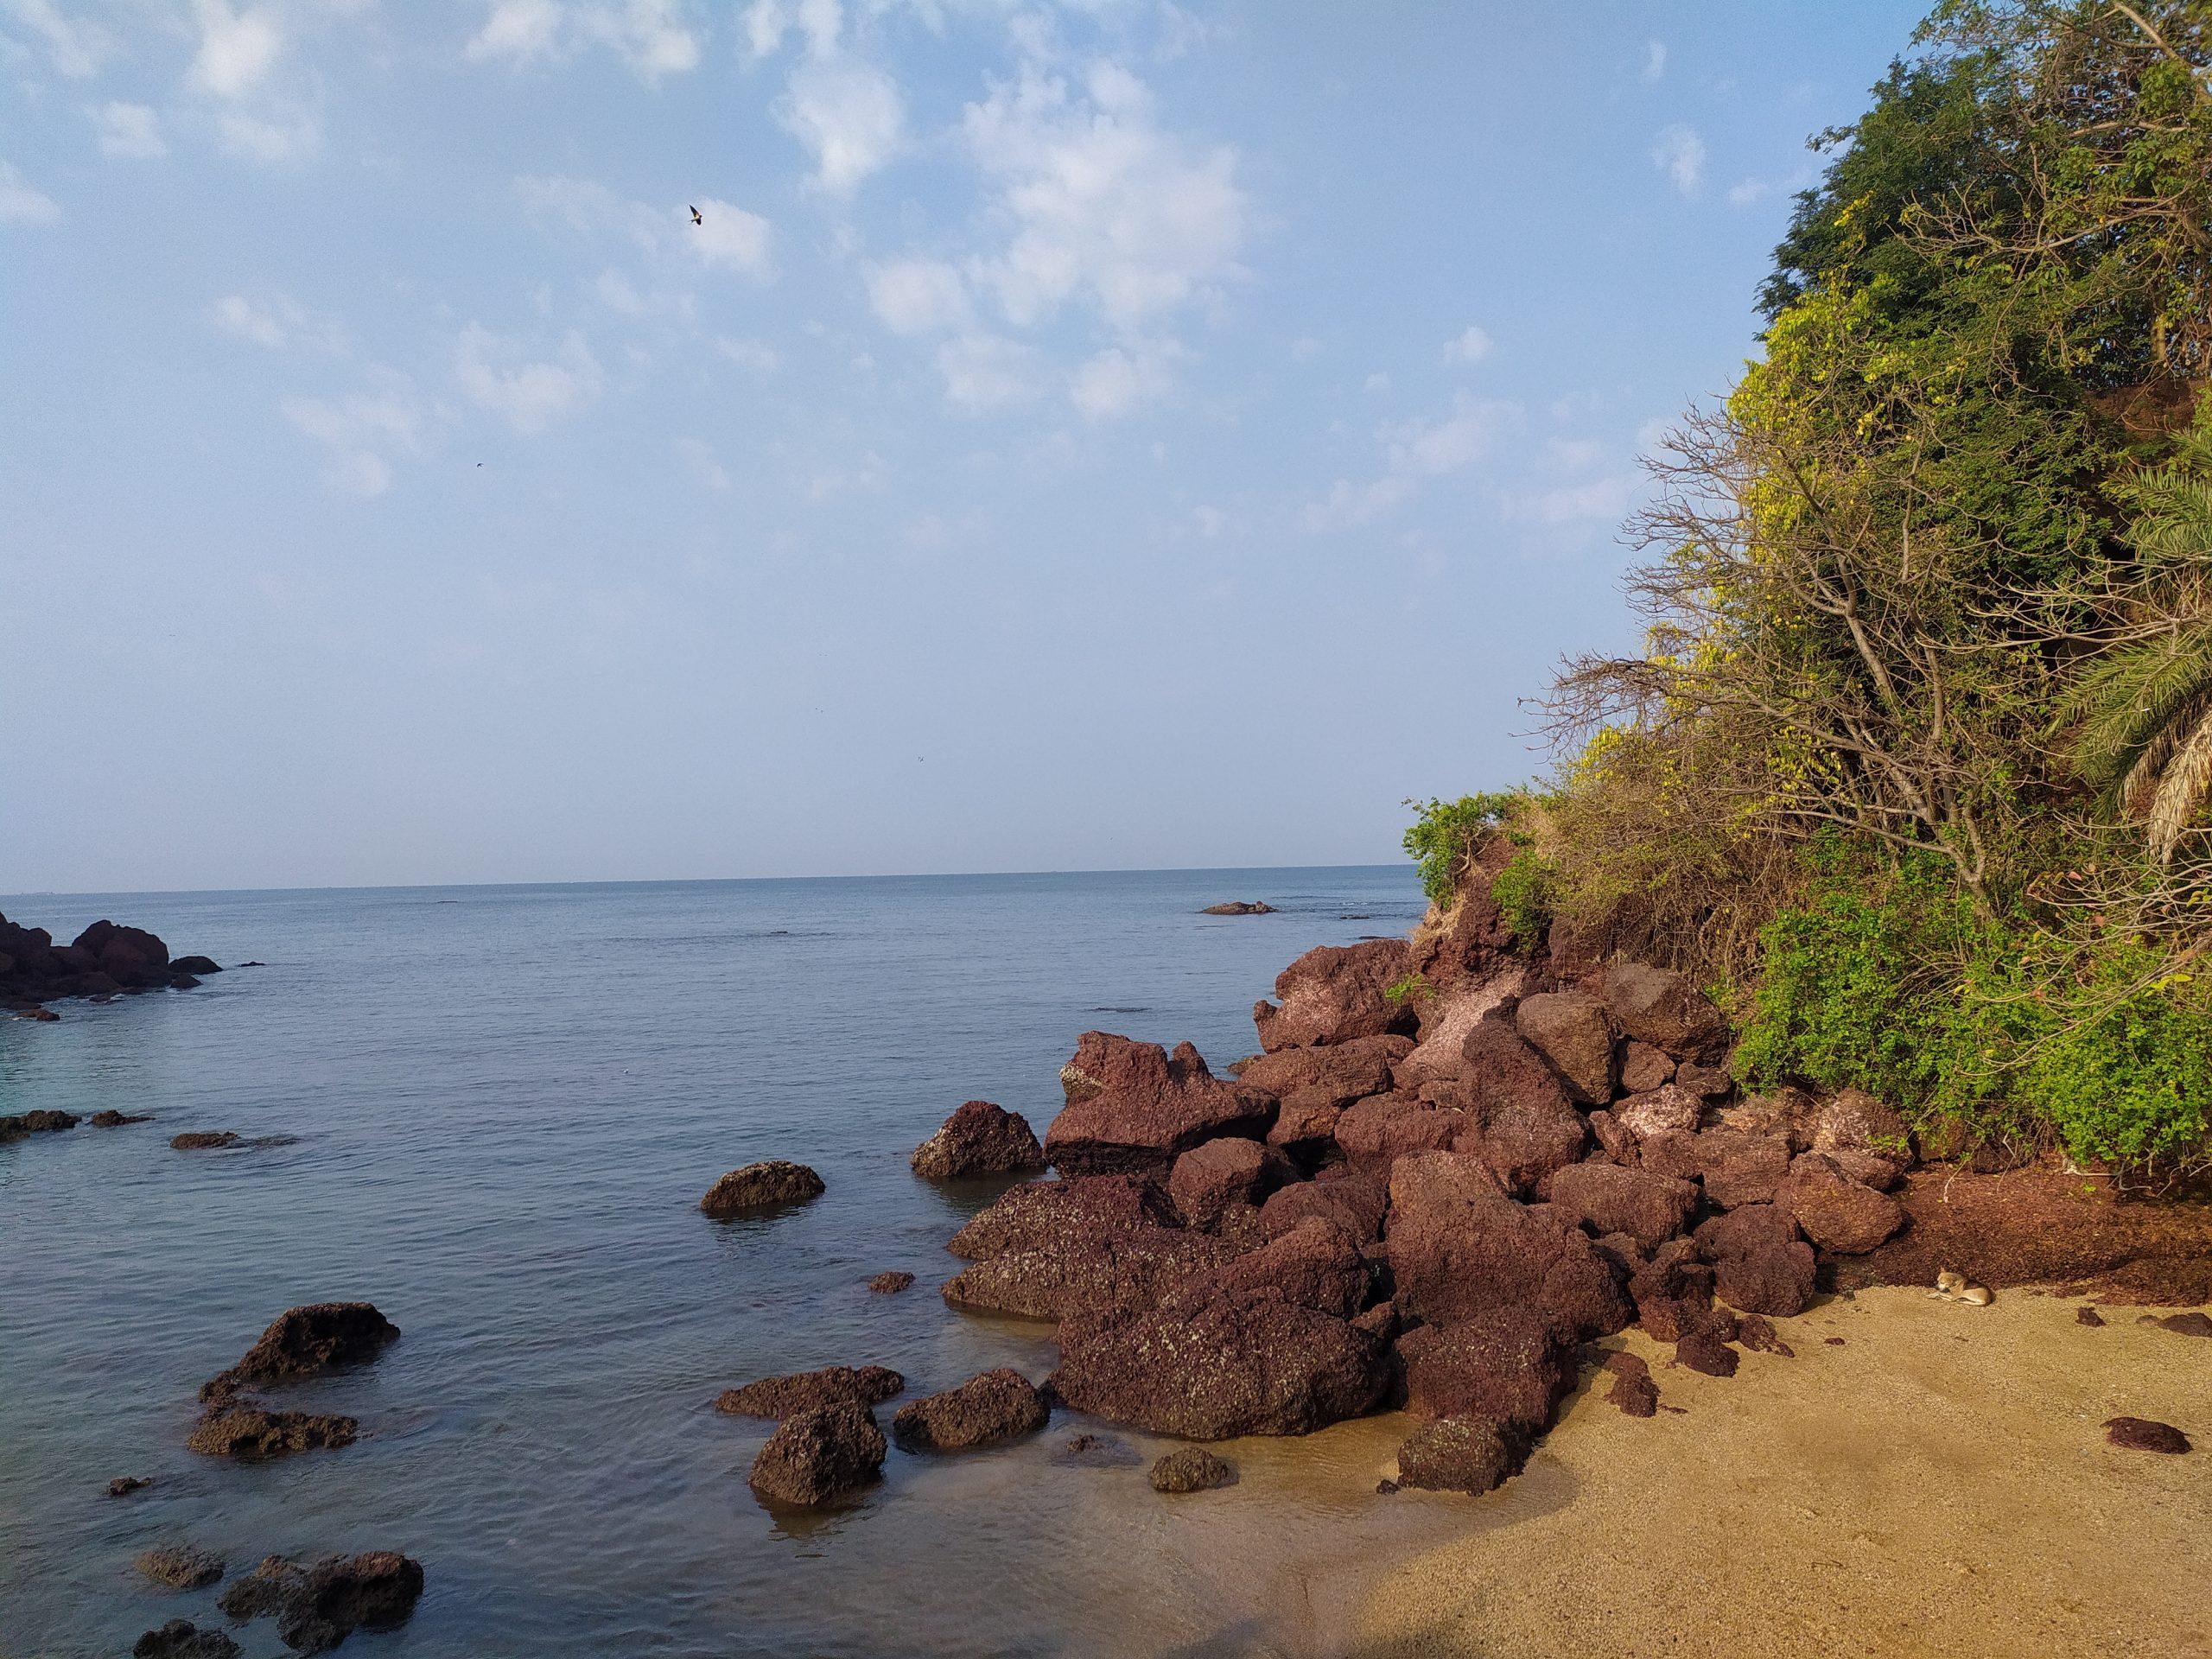 Stunning beach on a sunny day